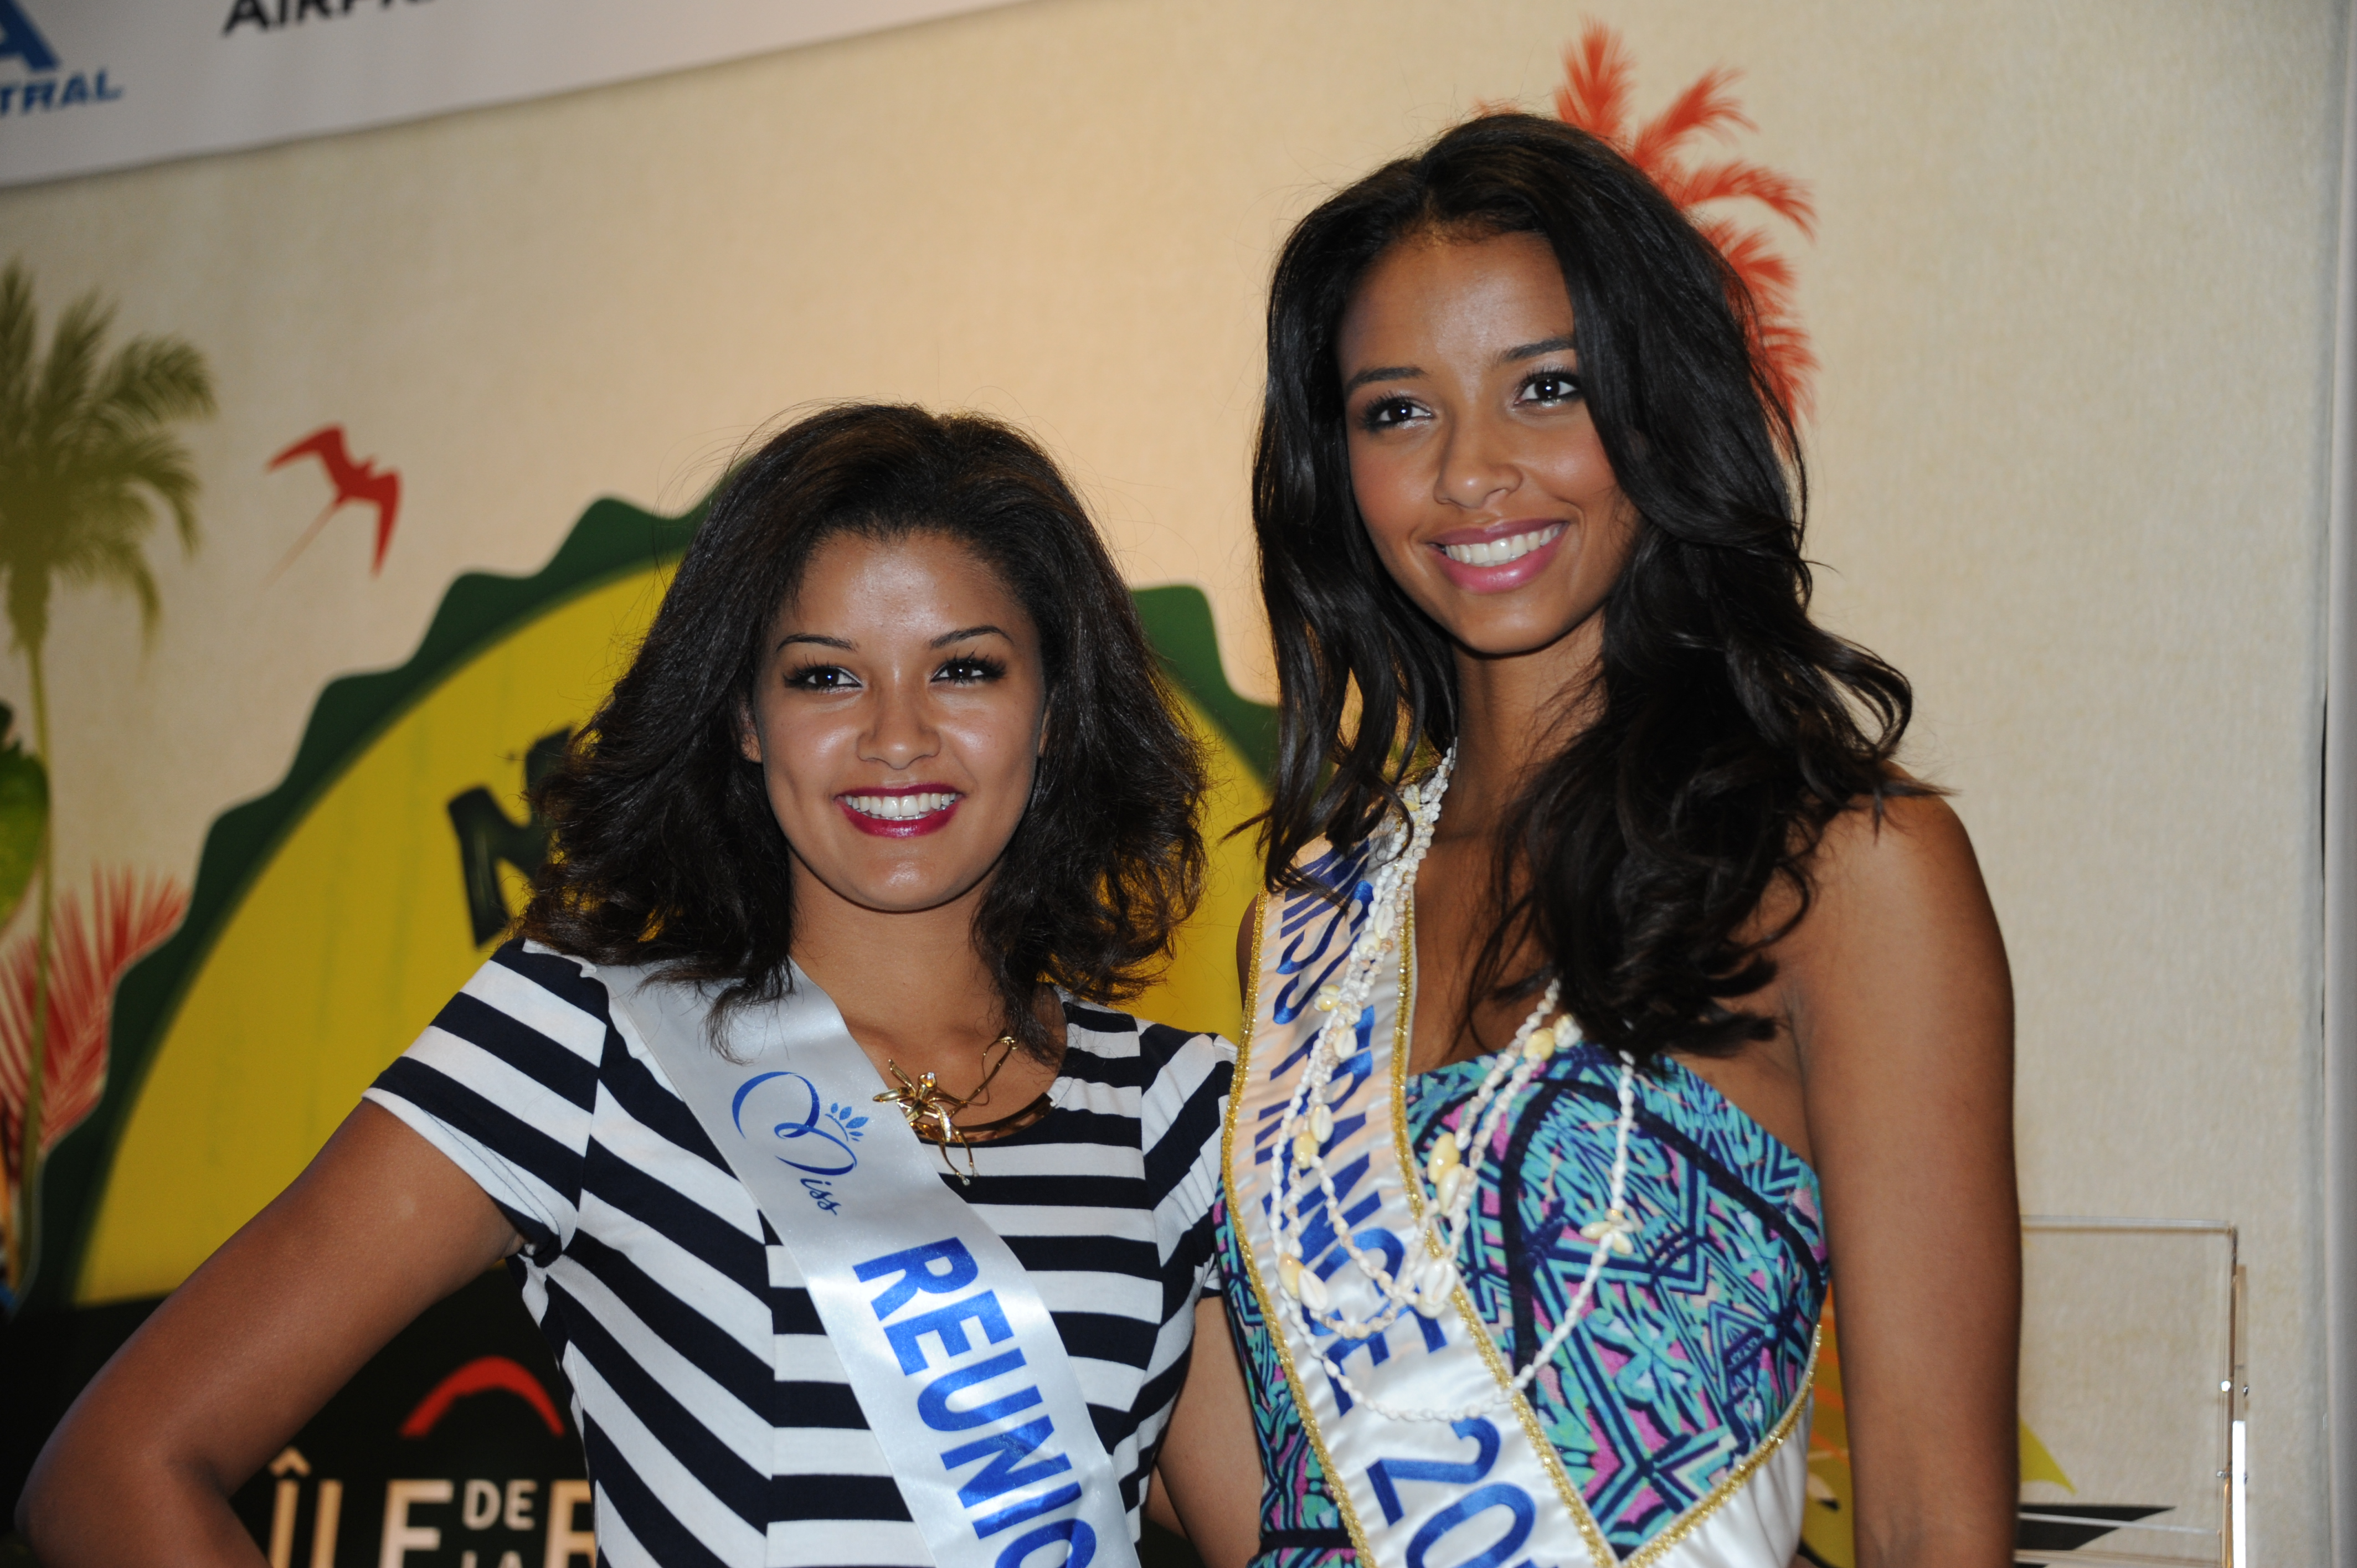 Ingreed Mercredi, Miss Réunion 2014, et Flora Coquerel, Miss France 2014